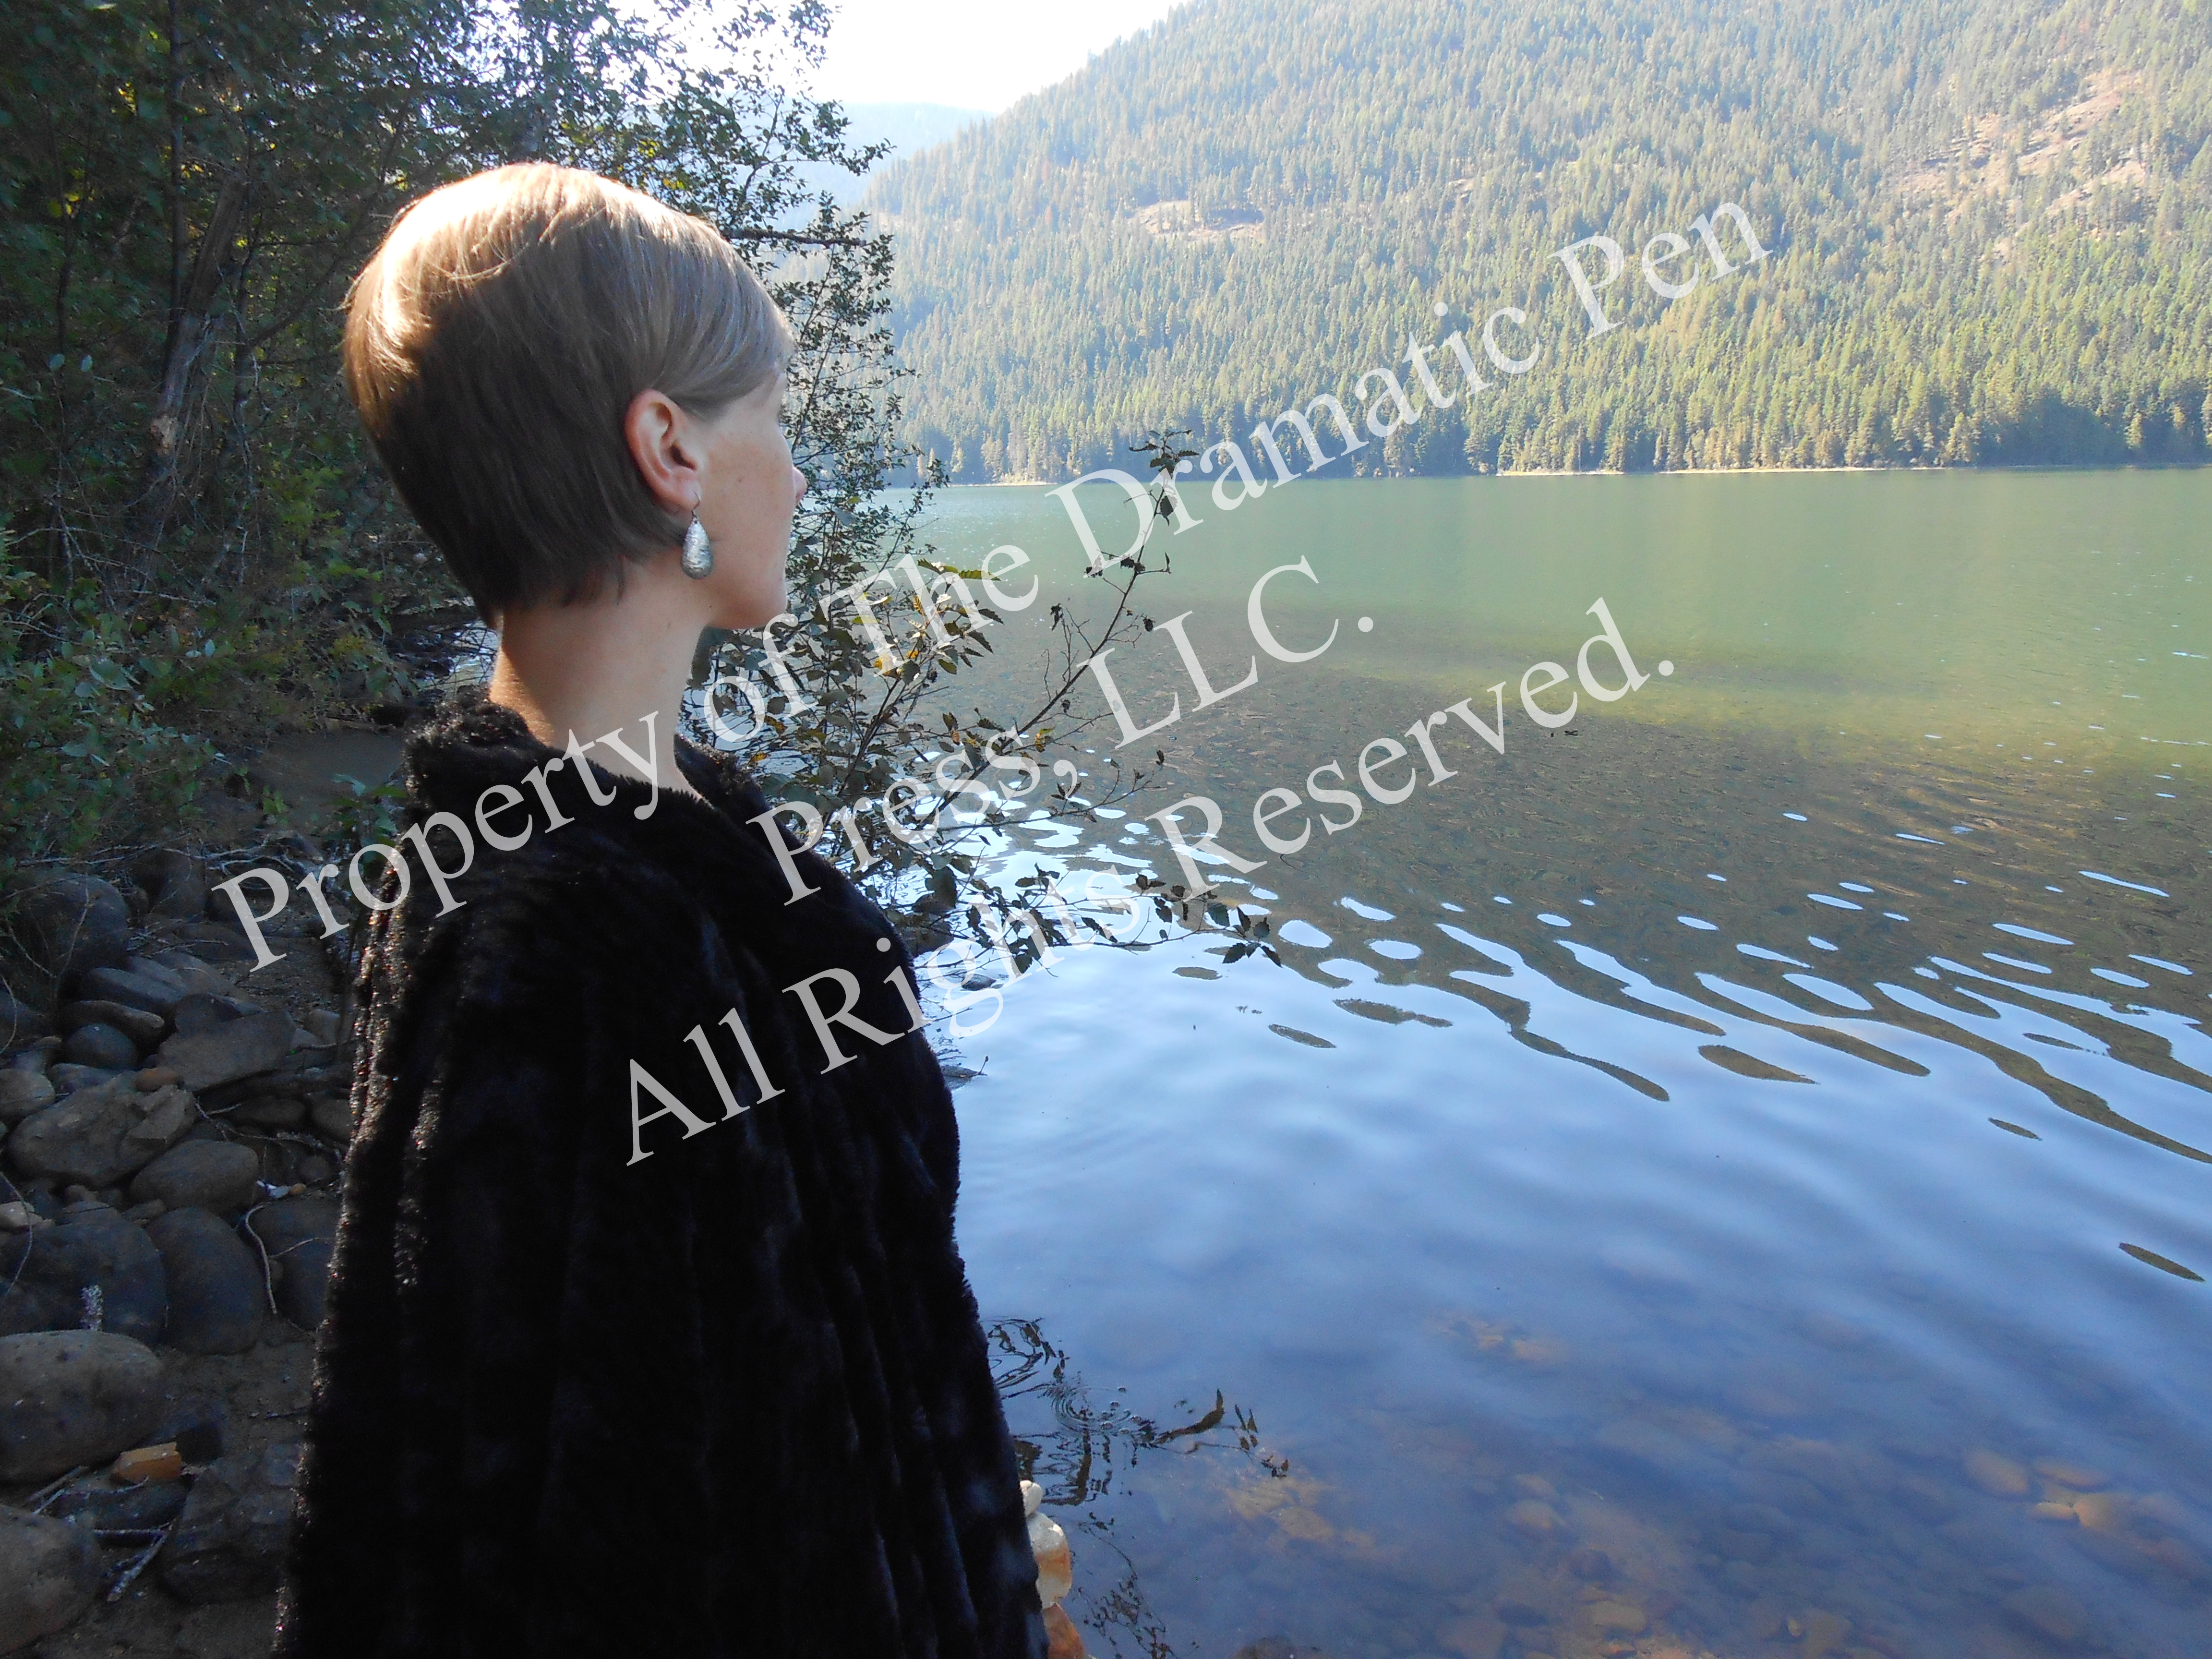 Profile of Woman by Lake